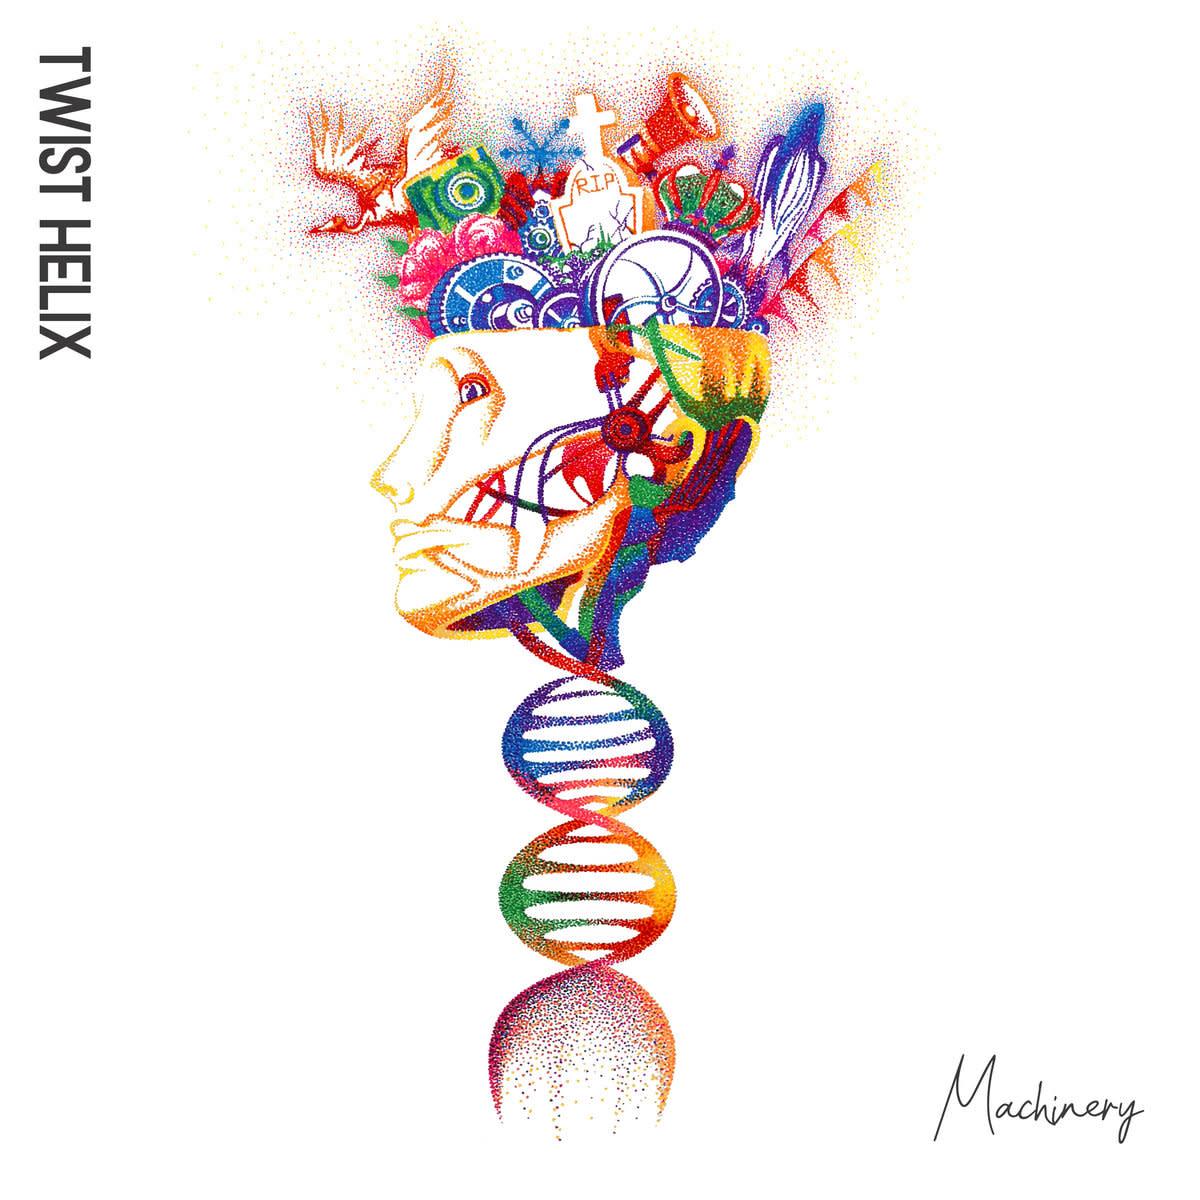 electronic-alt-pop-album-review-machinery-by-twist-helix